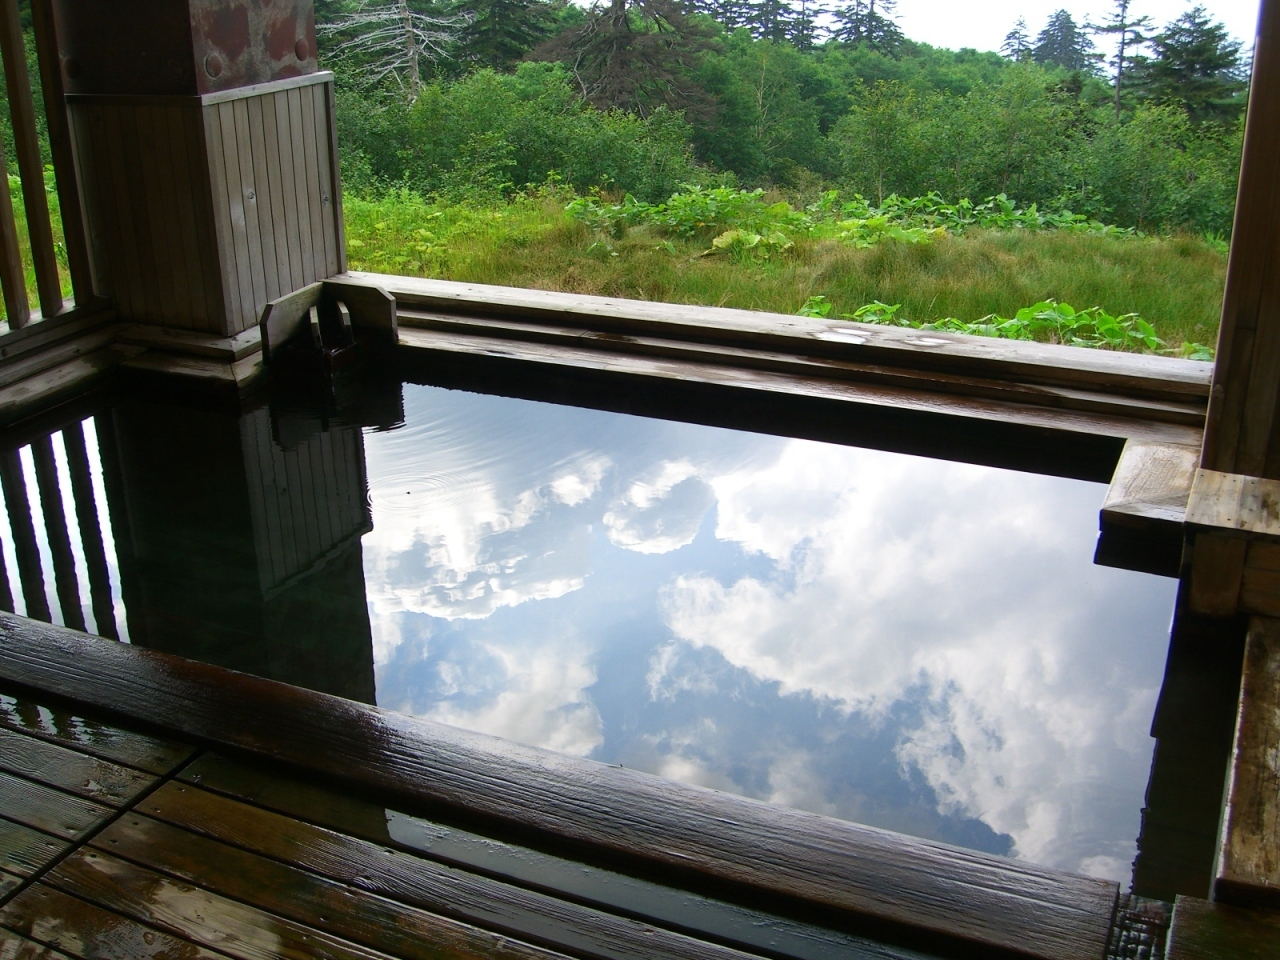 十勝岳温泉 カミホロ荘 / 北海道